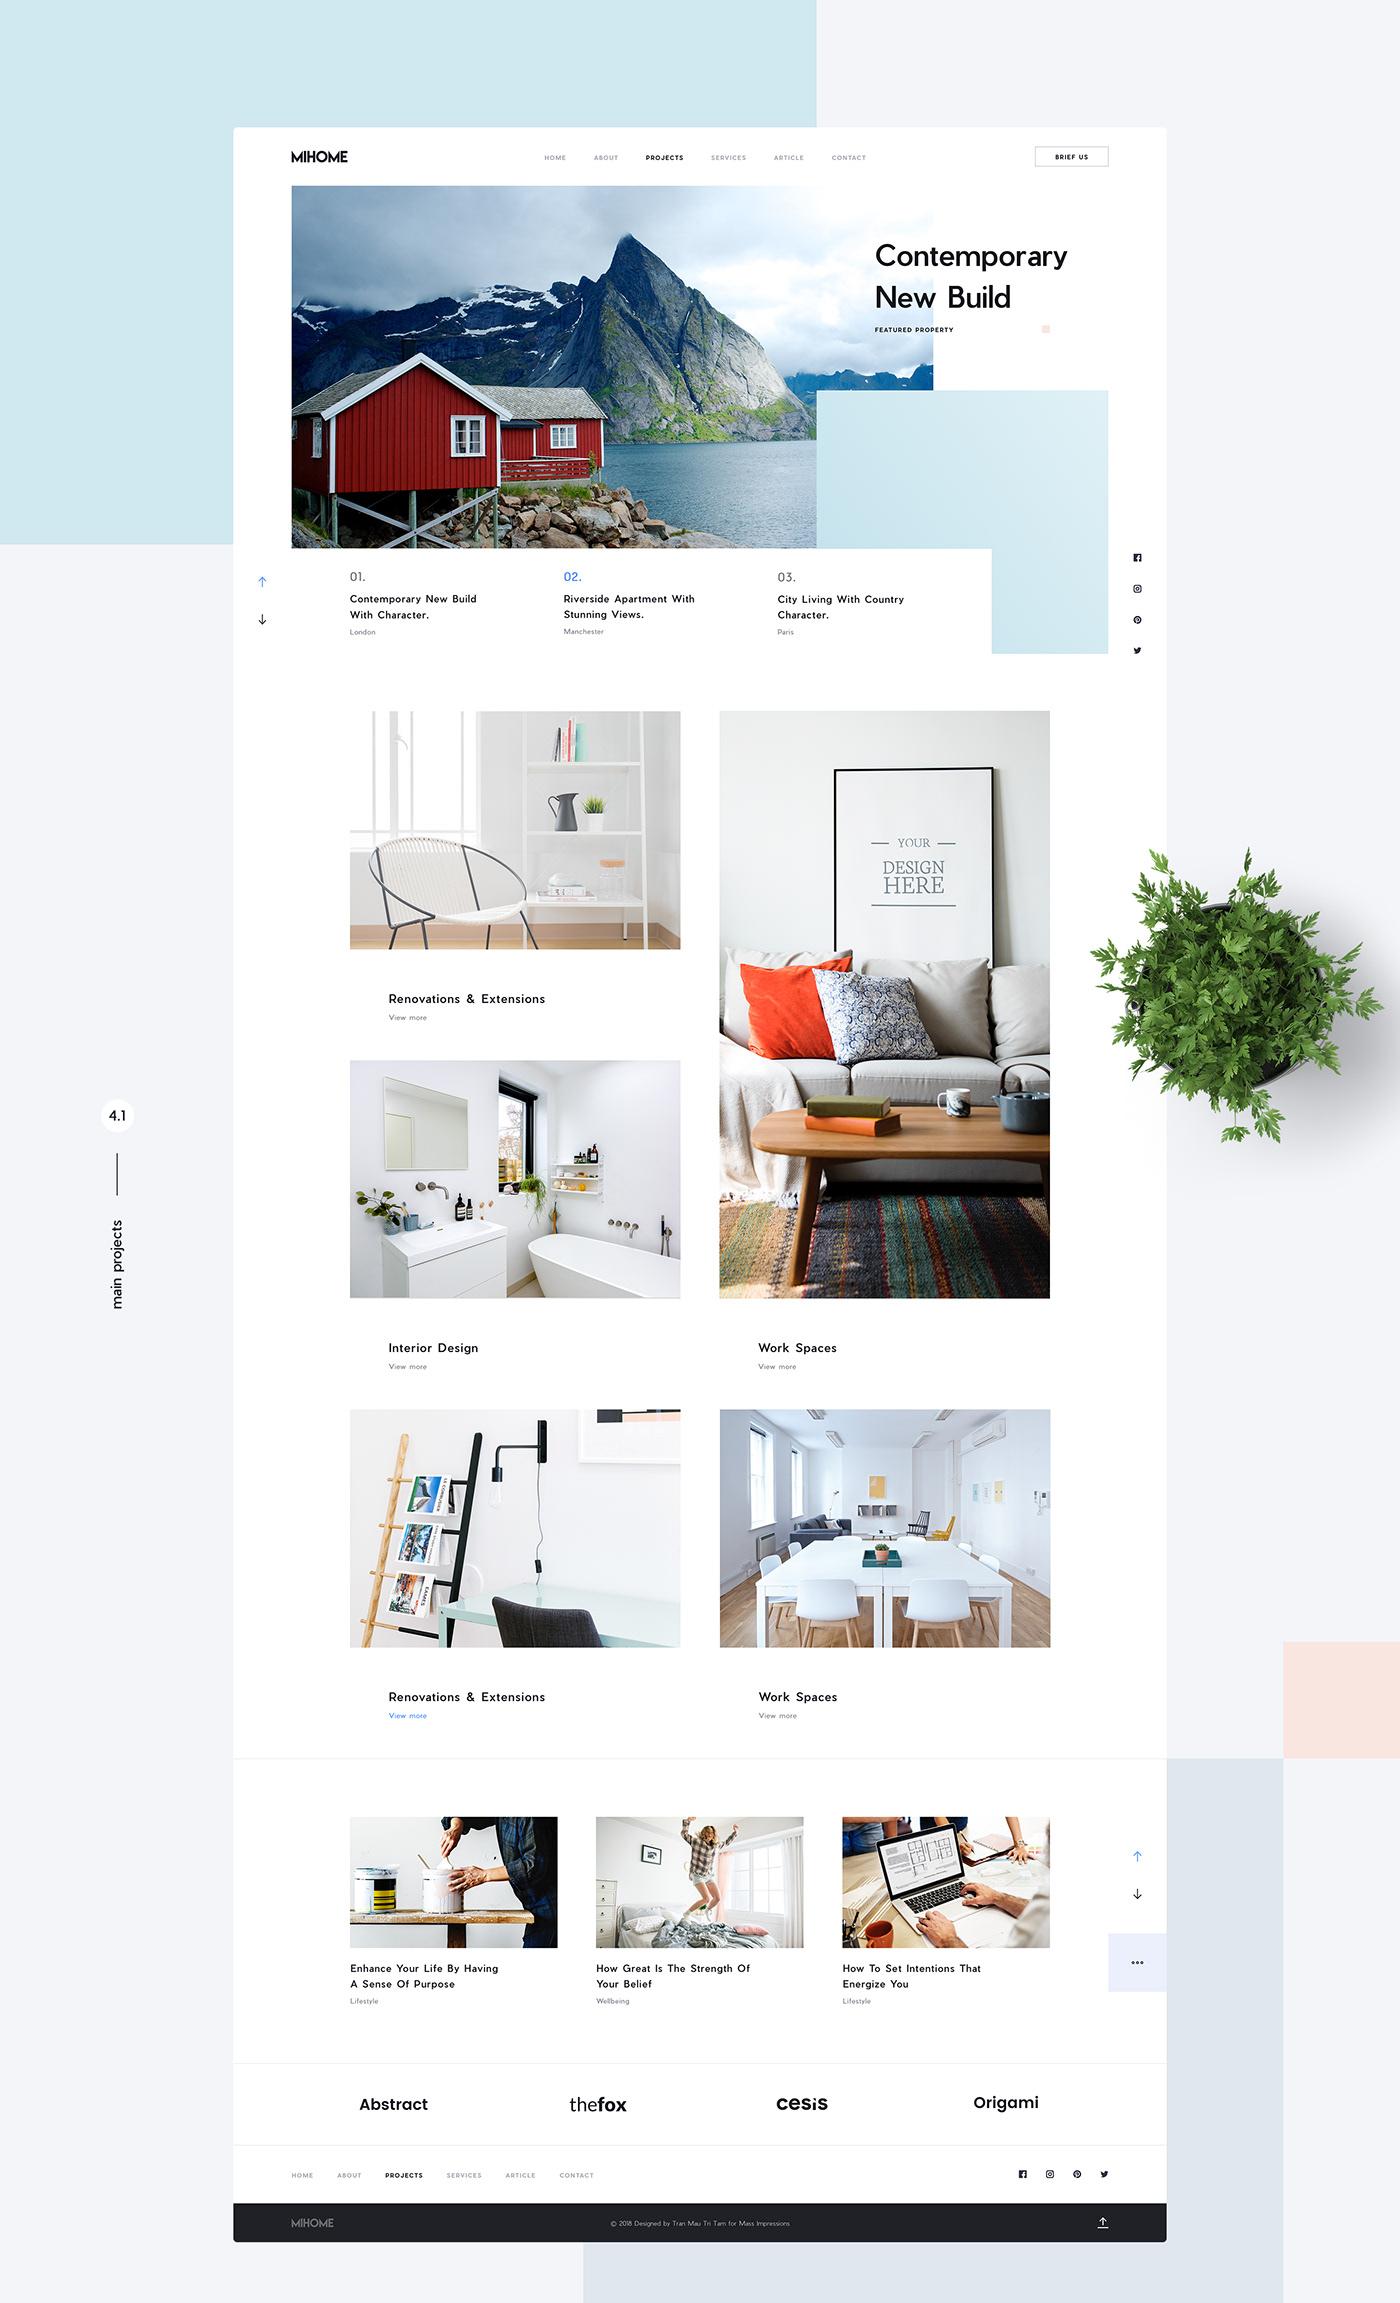 Architechtural design construction property real estate free sketch sketch app free download house home